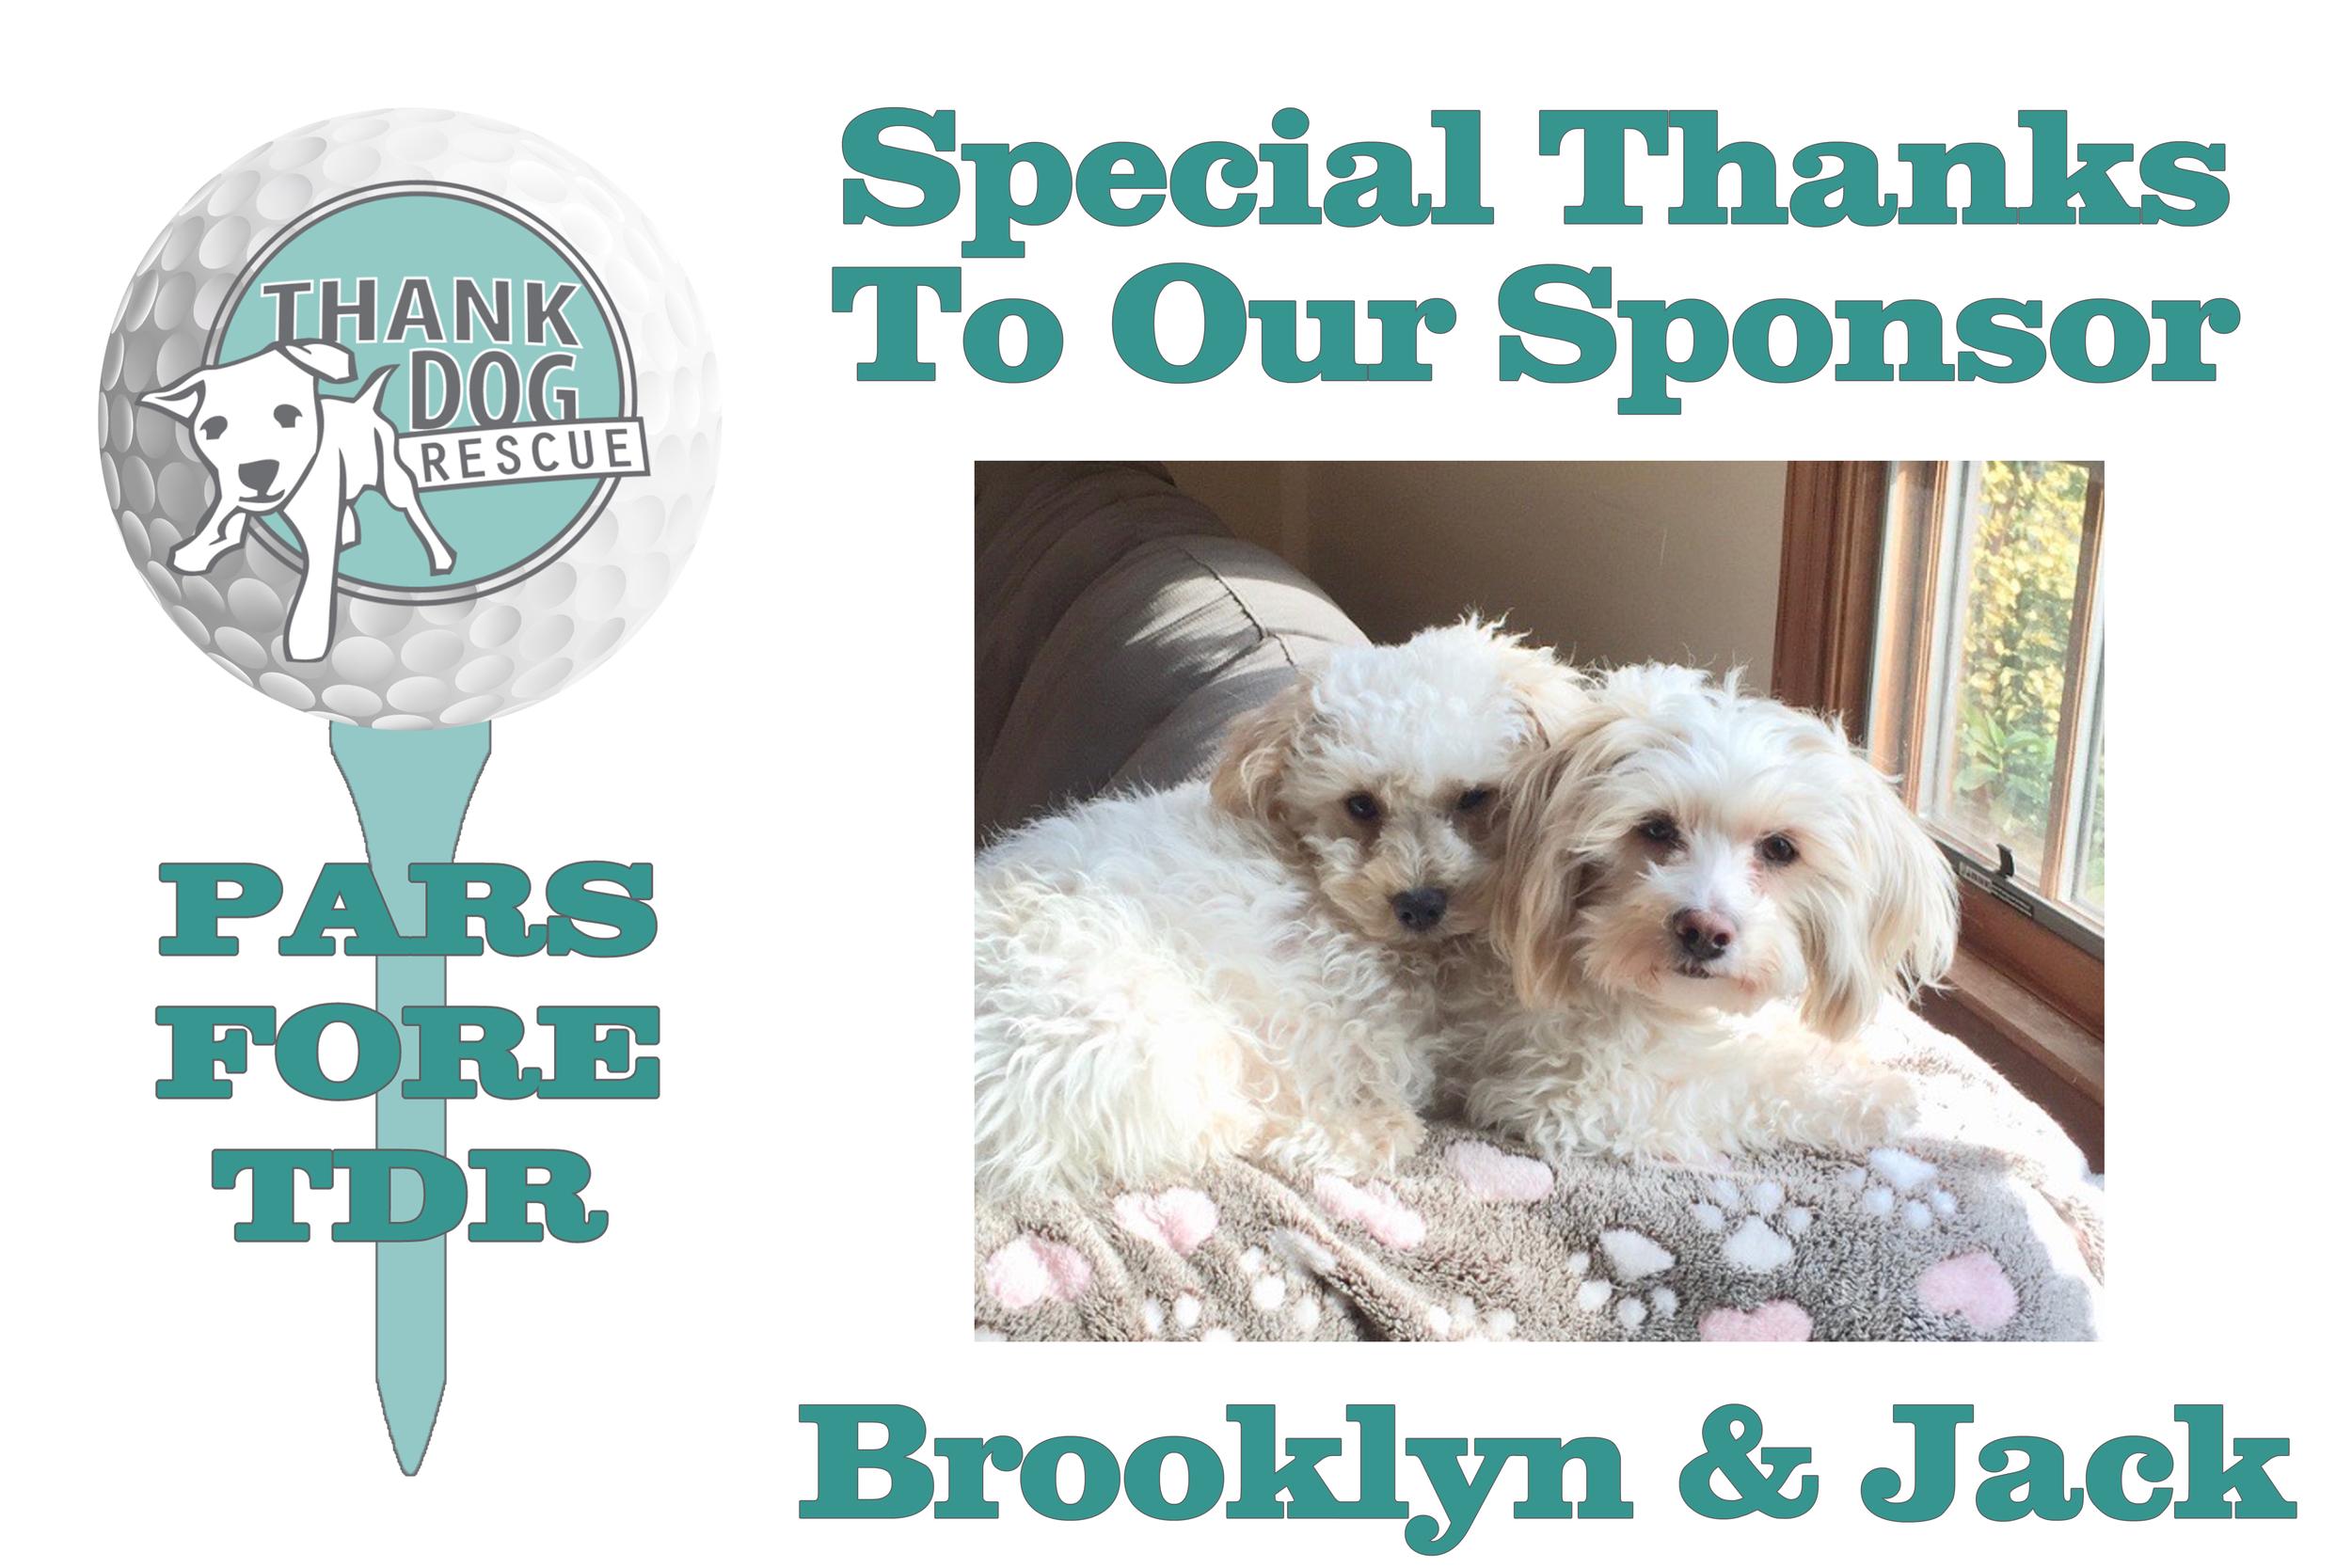 brooklyn and jack sponsor.png